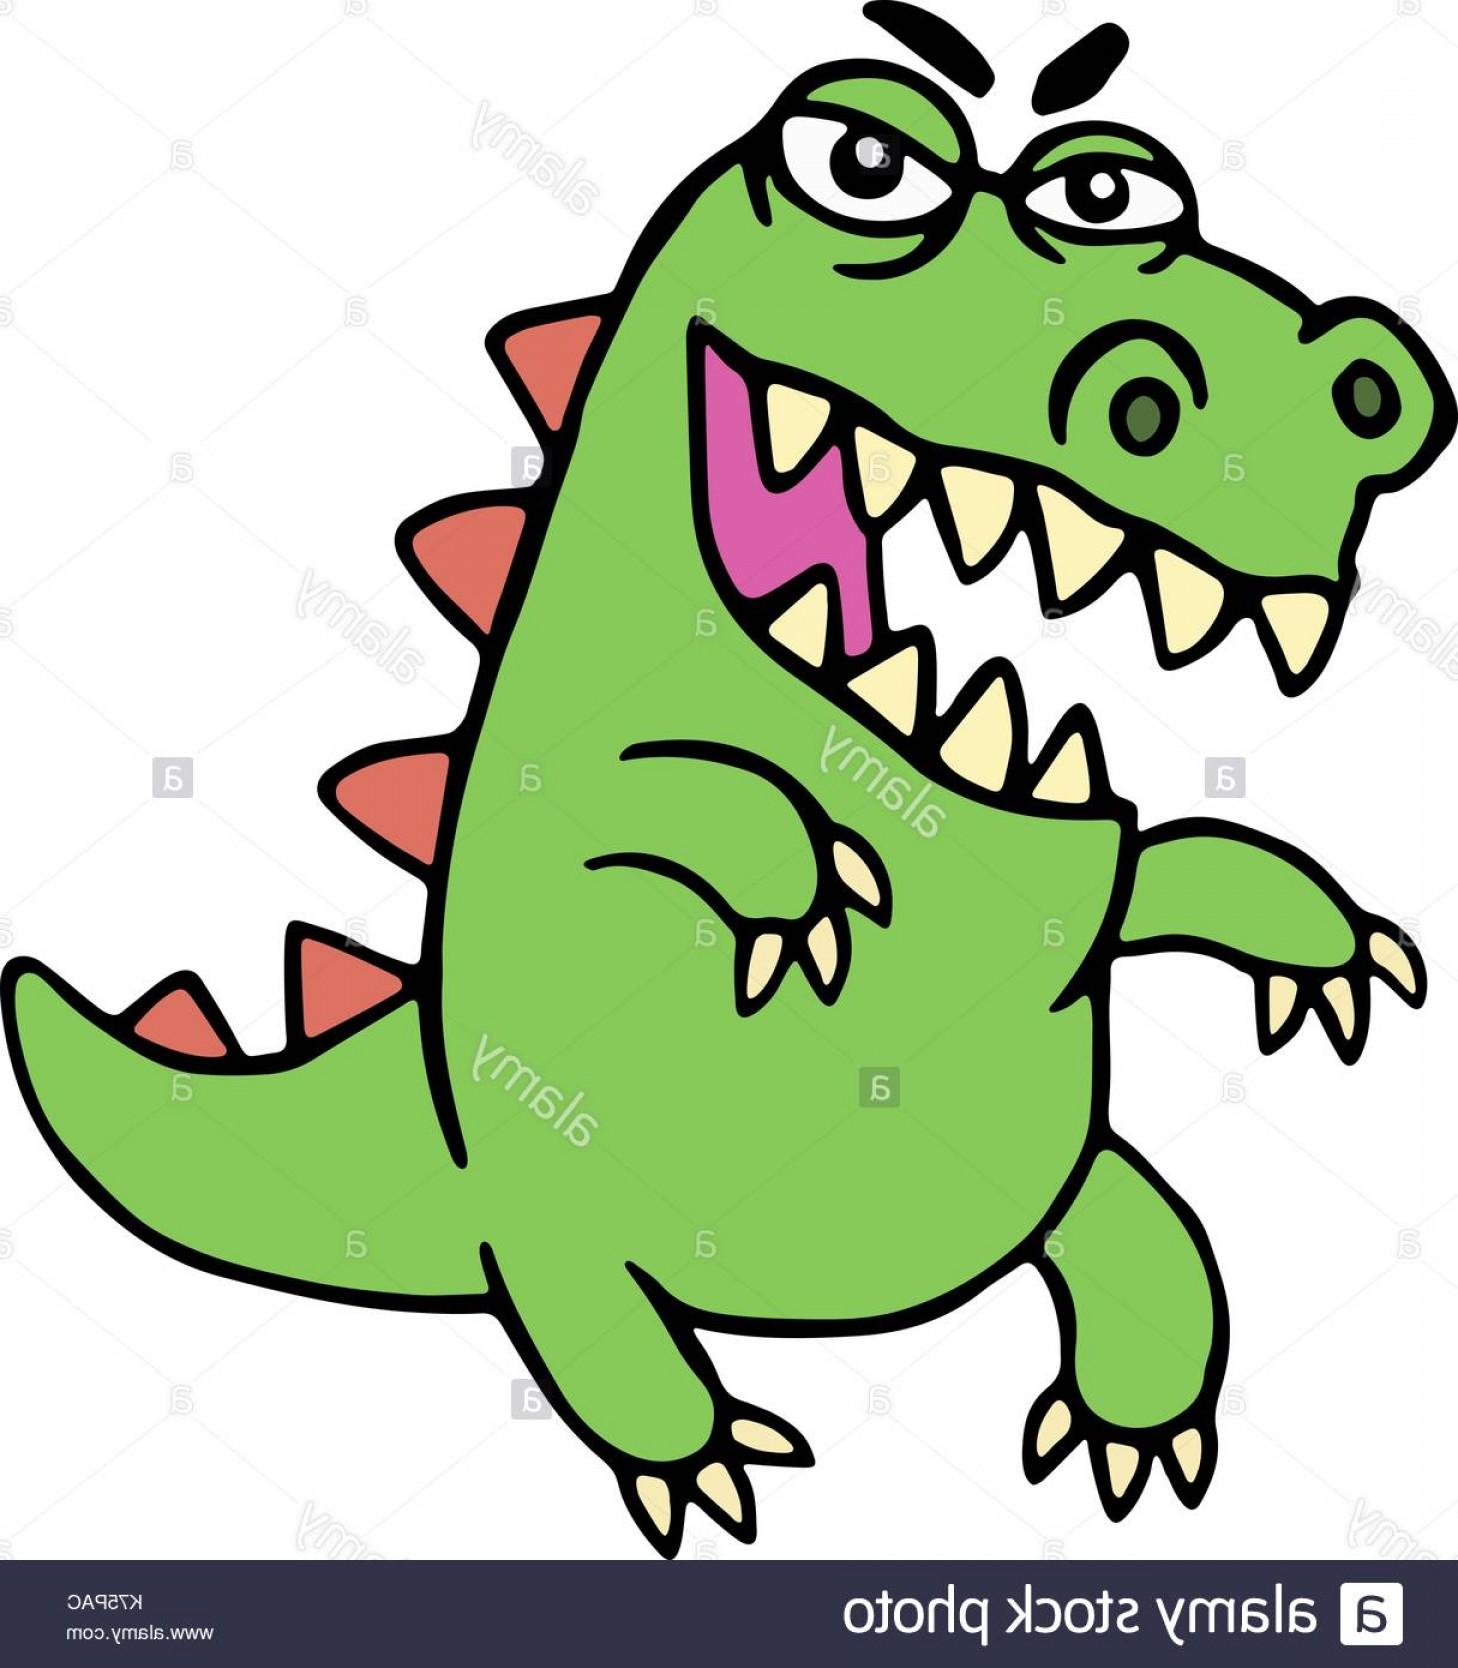 1458x1668 Stock Photo Cute Angry Cartoon Dinosaur Vector Illustration Funny